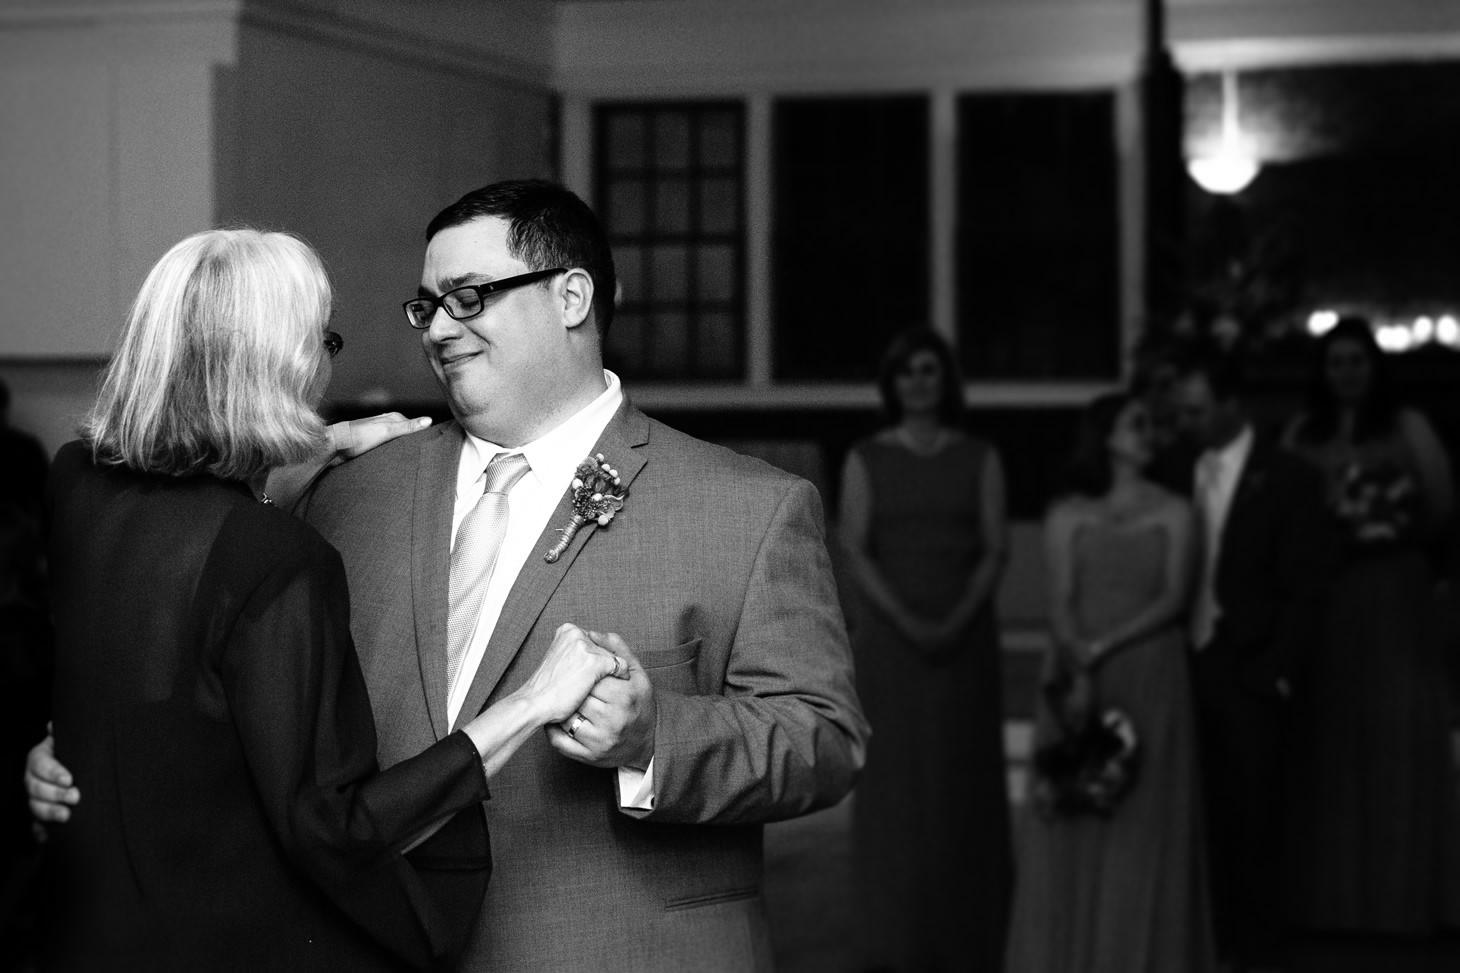 nyc-brooklyn-prospect-park-picnic-house-wedding-smitten-chickens-nerdy-48.jpg